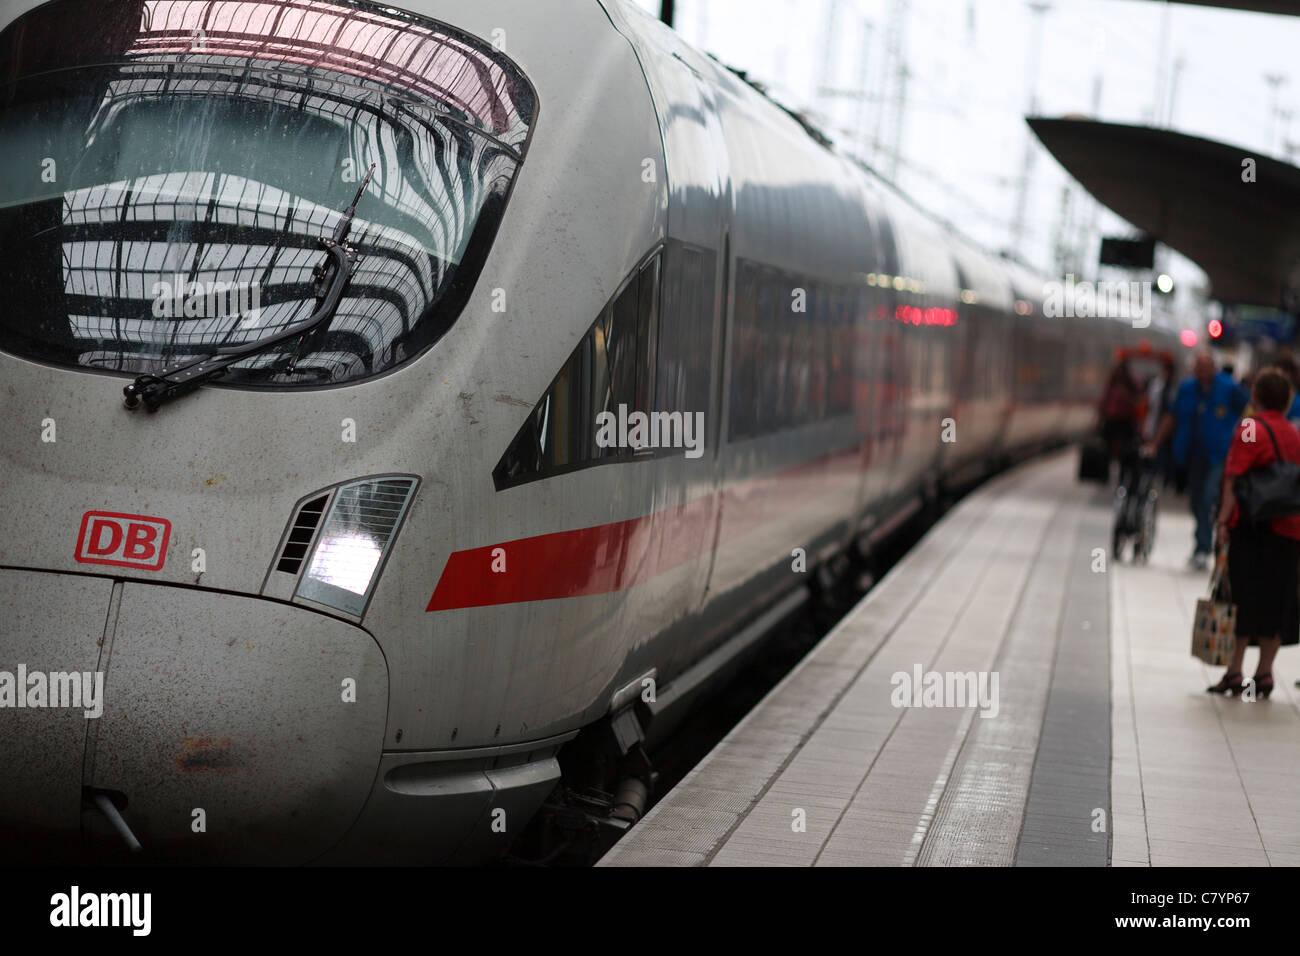 Deutsche Bahn Bahnhof Frankfurt Main Bahnhof im Bundesland Hessen. Stockbild